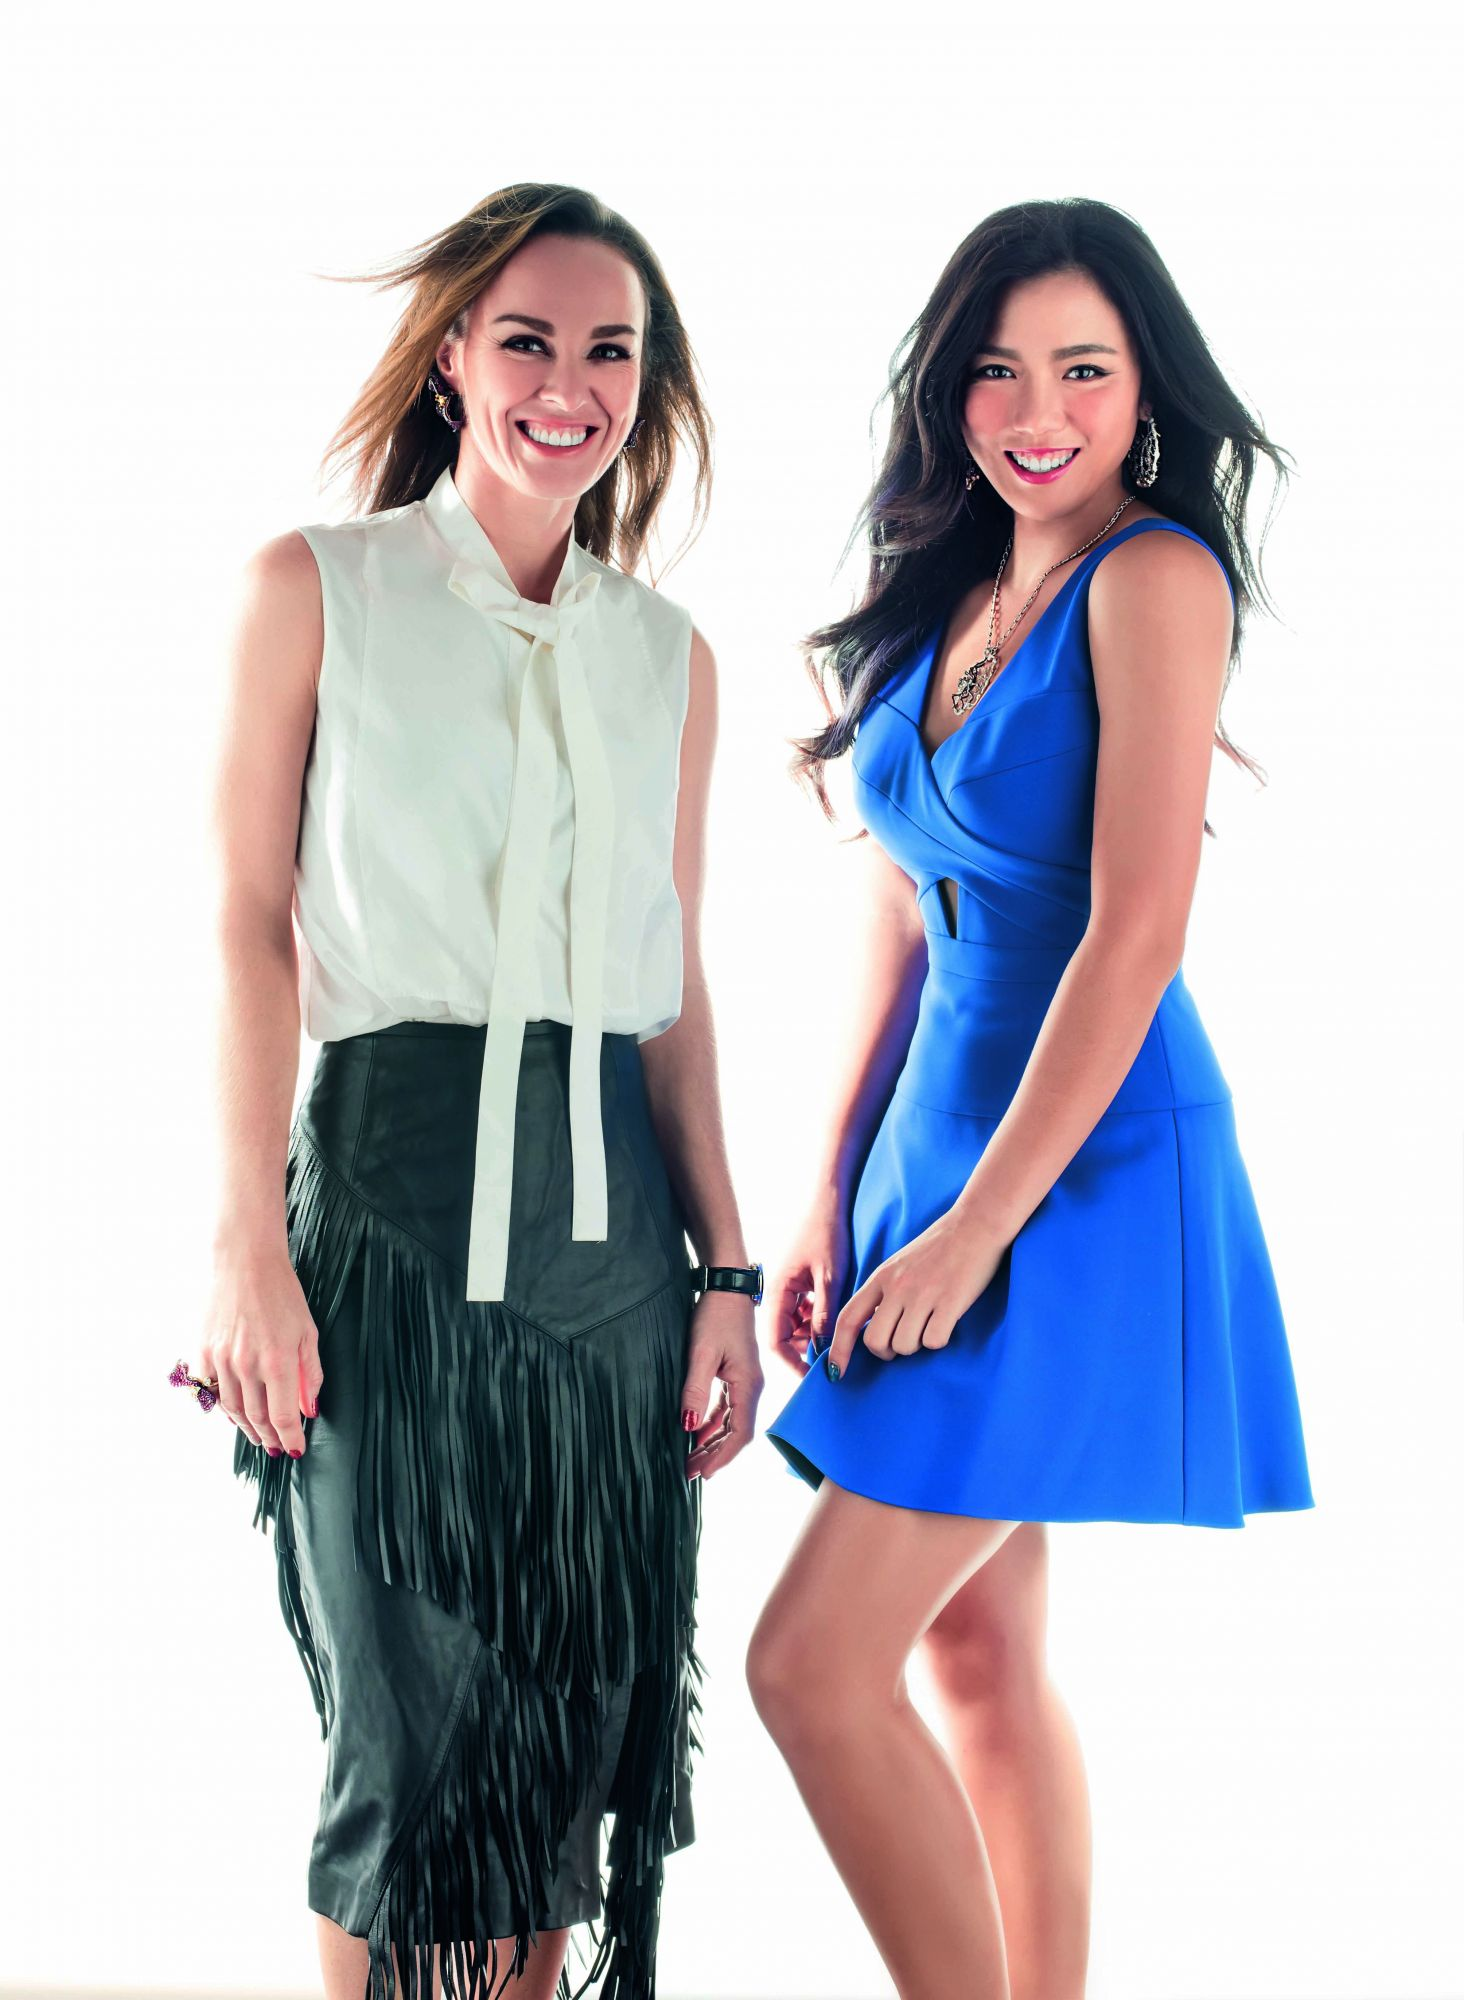 Martina Hingis And Latisha Chan On The End Of An Era